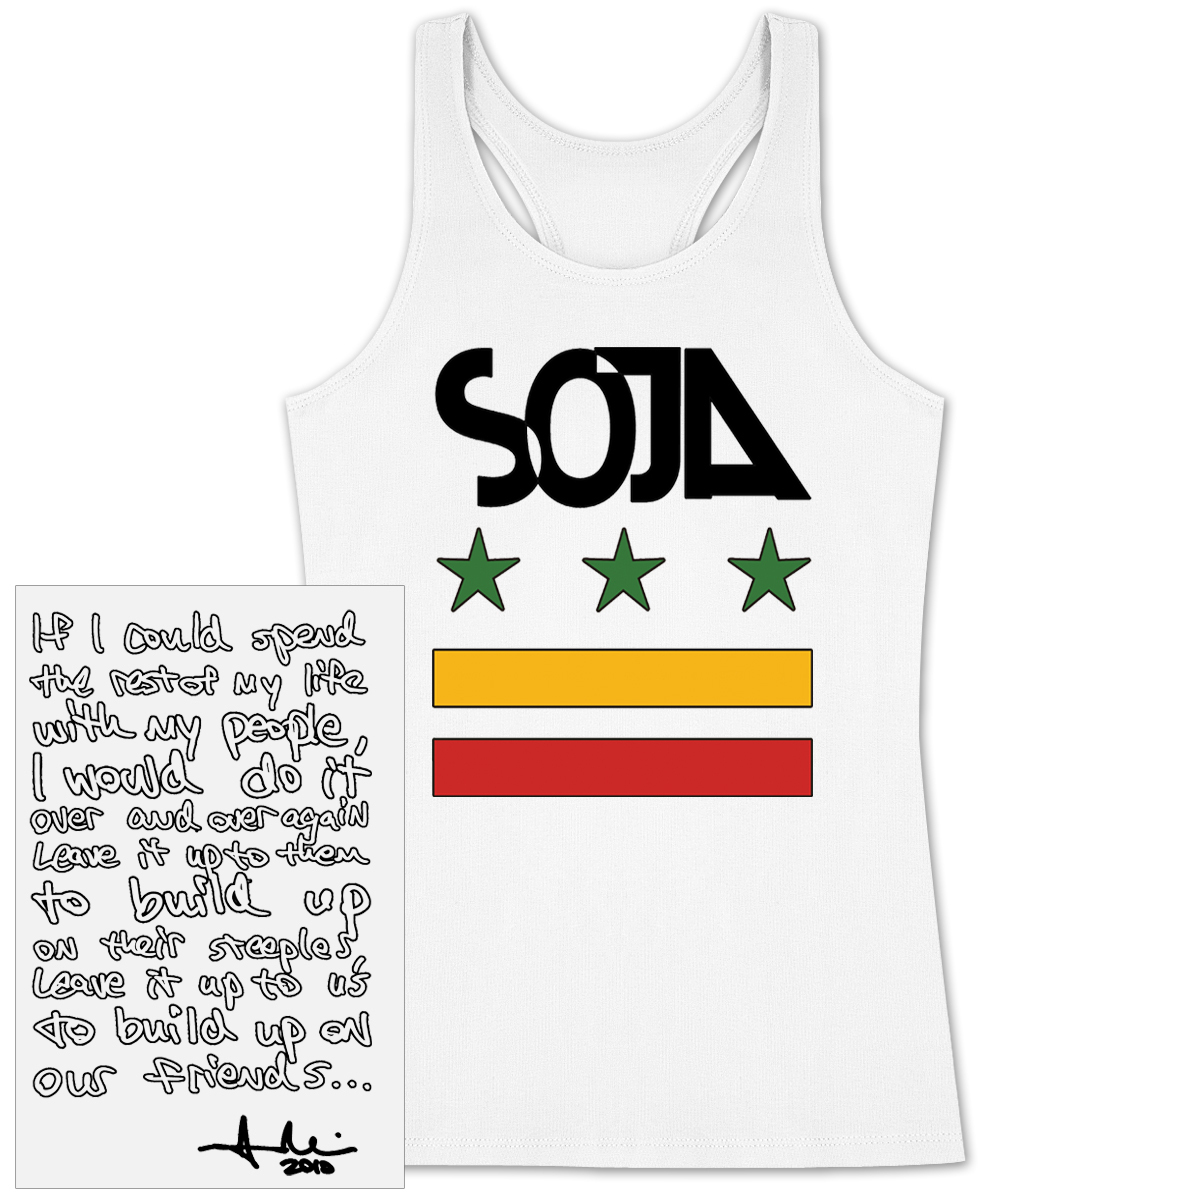 SOJA - Rest Of My Life Ladies Cut Tank